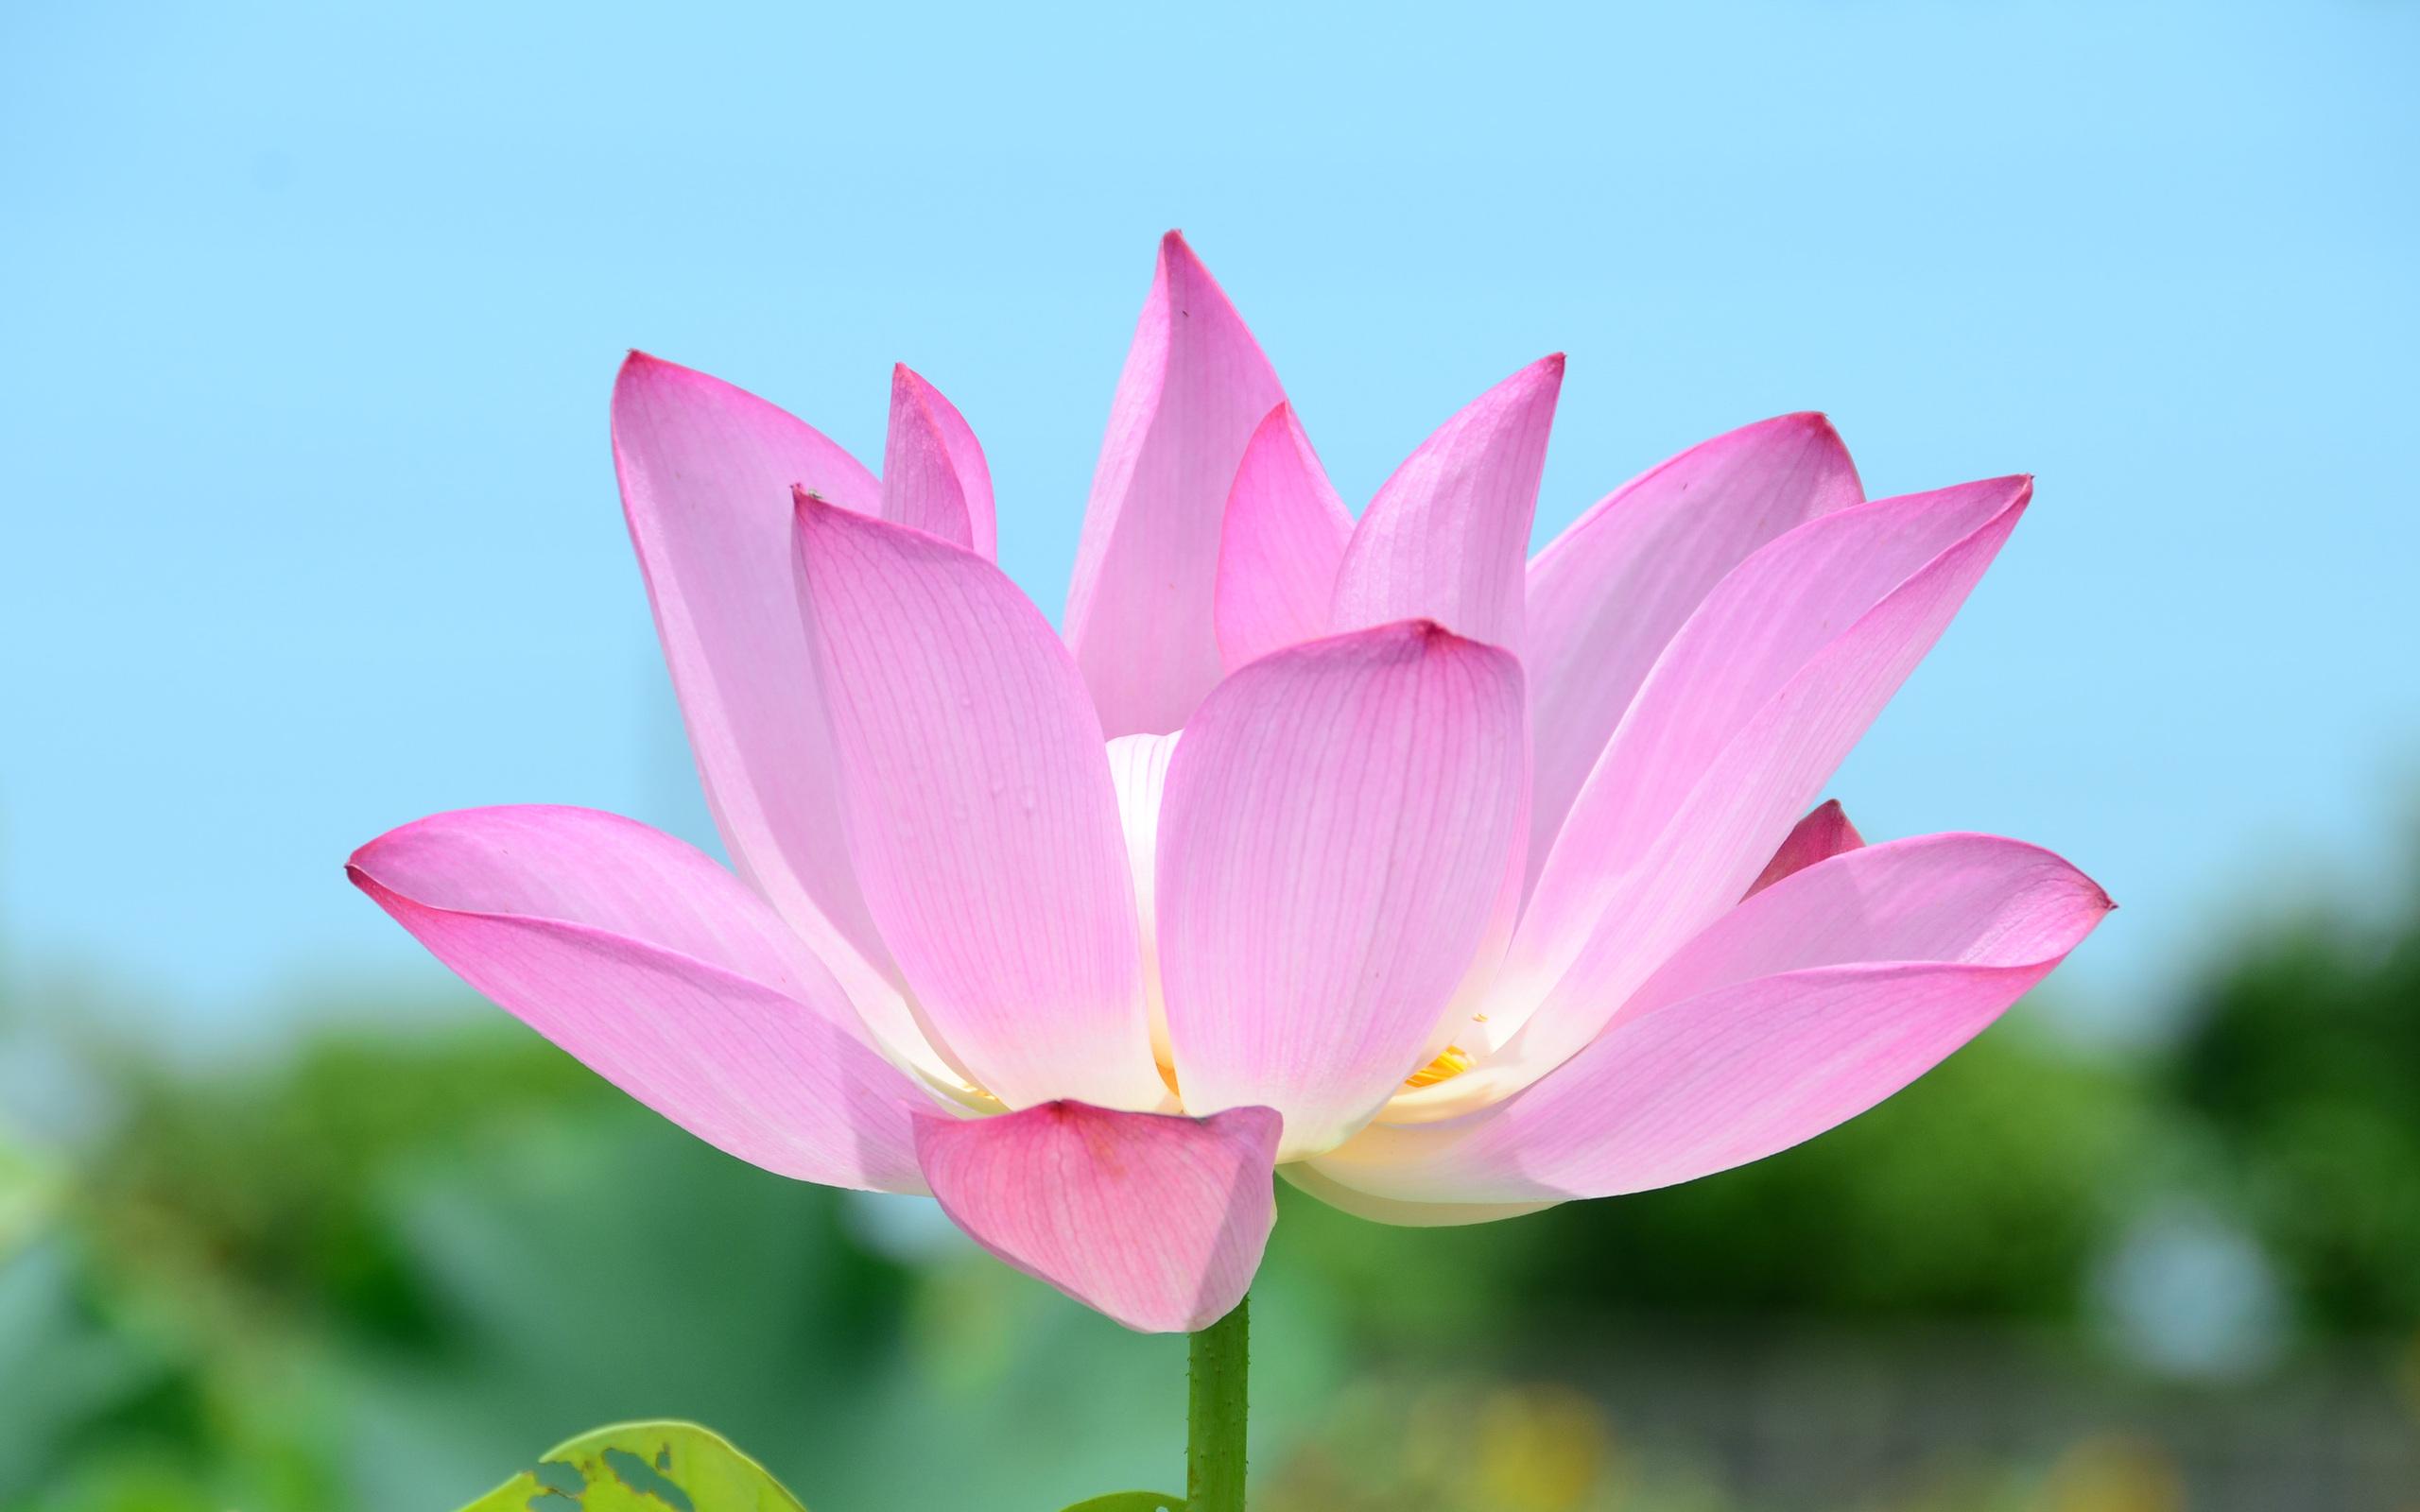 Lotus Flower Wallpaper Free Download Labzada Wallpaper